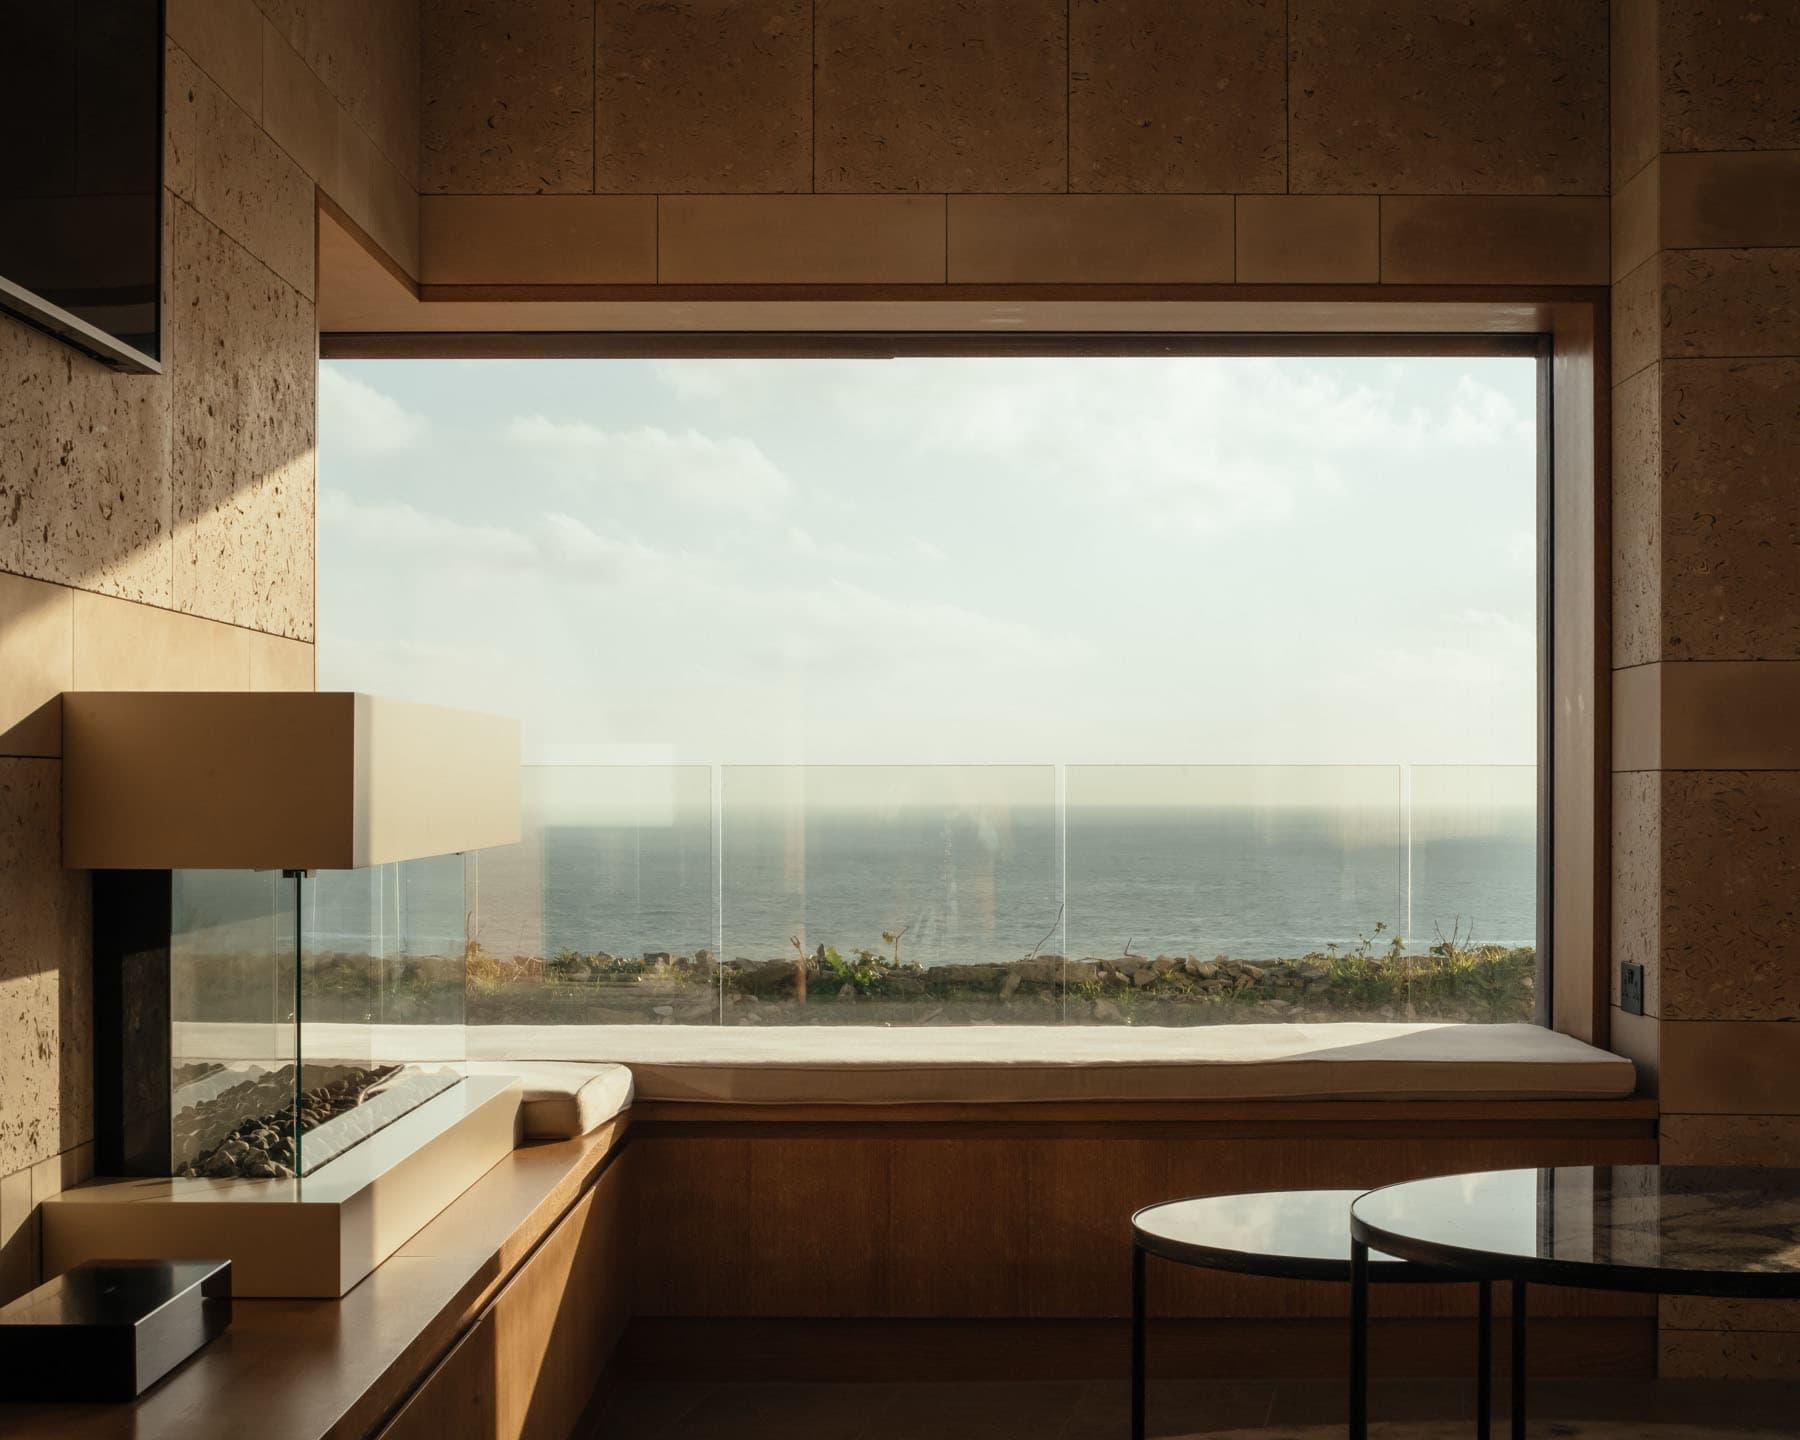 Frameless picture window overlooking coastal views